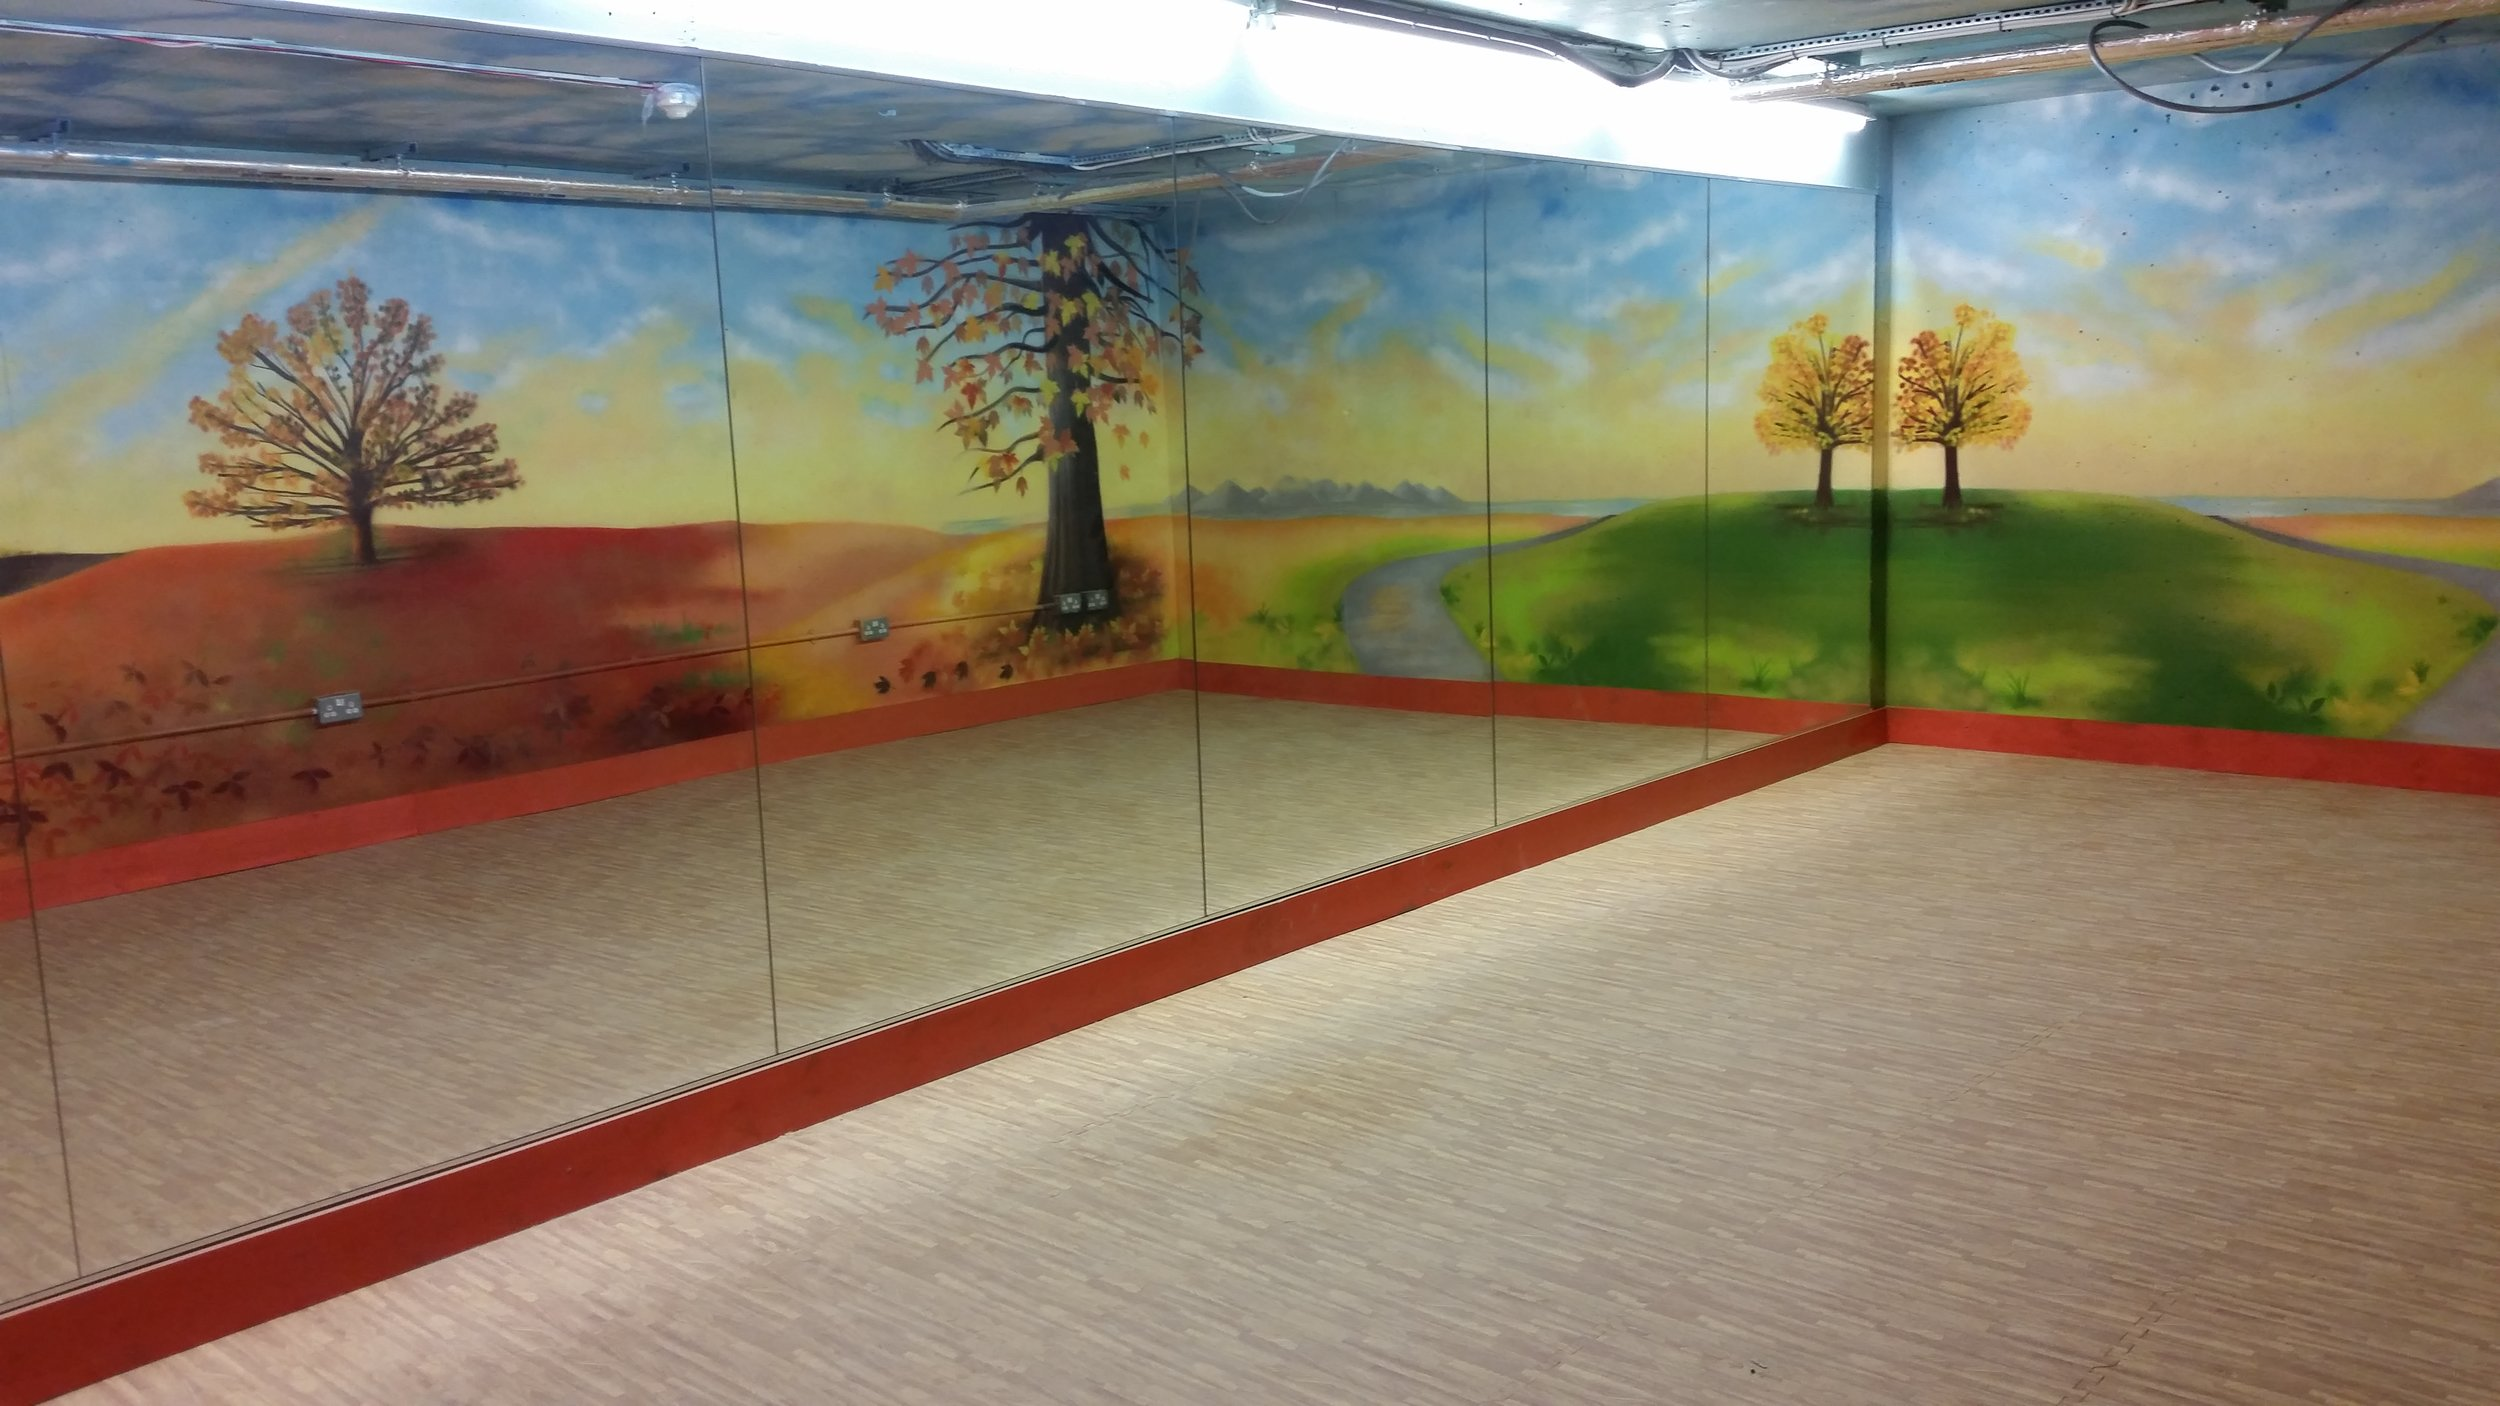 Lib-rary Gym mural (94).jpg